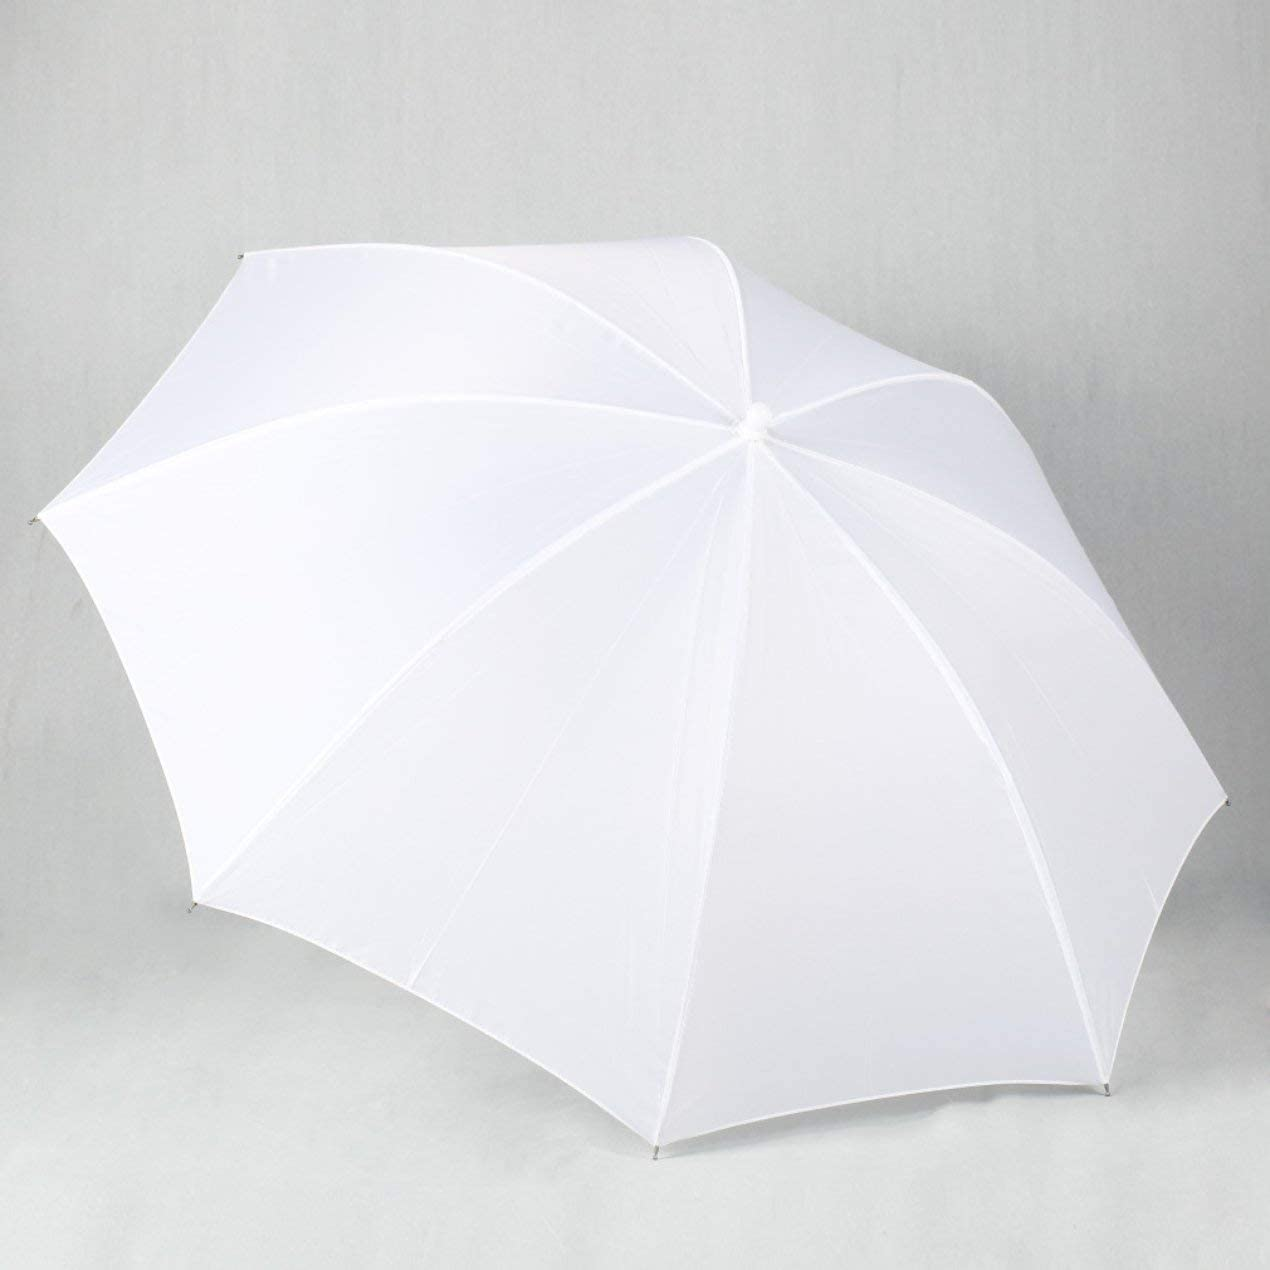 Jullynice Portable Lightweight 33in 83cm Pro Studio Photography Flash Translucent Soft Lambency Umbrella White Nylon Material Aluminum Shaft